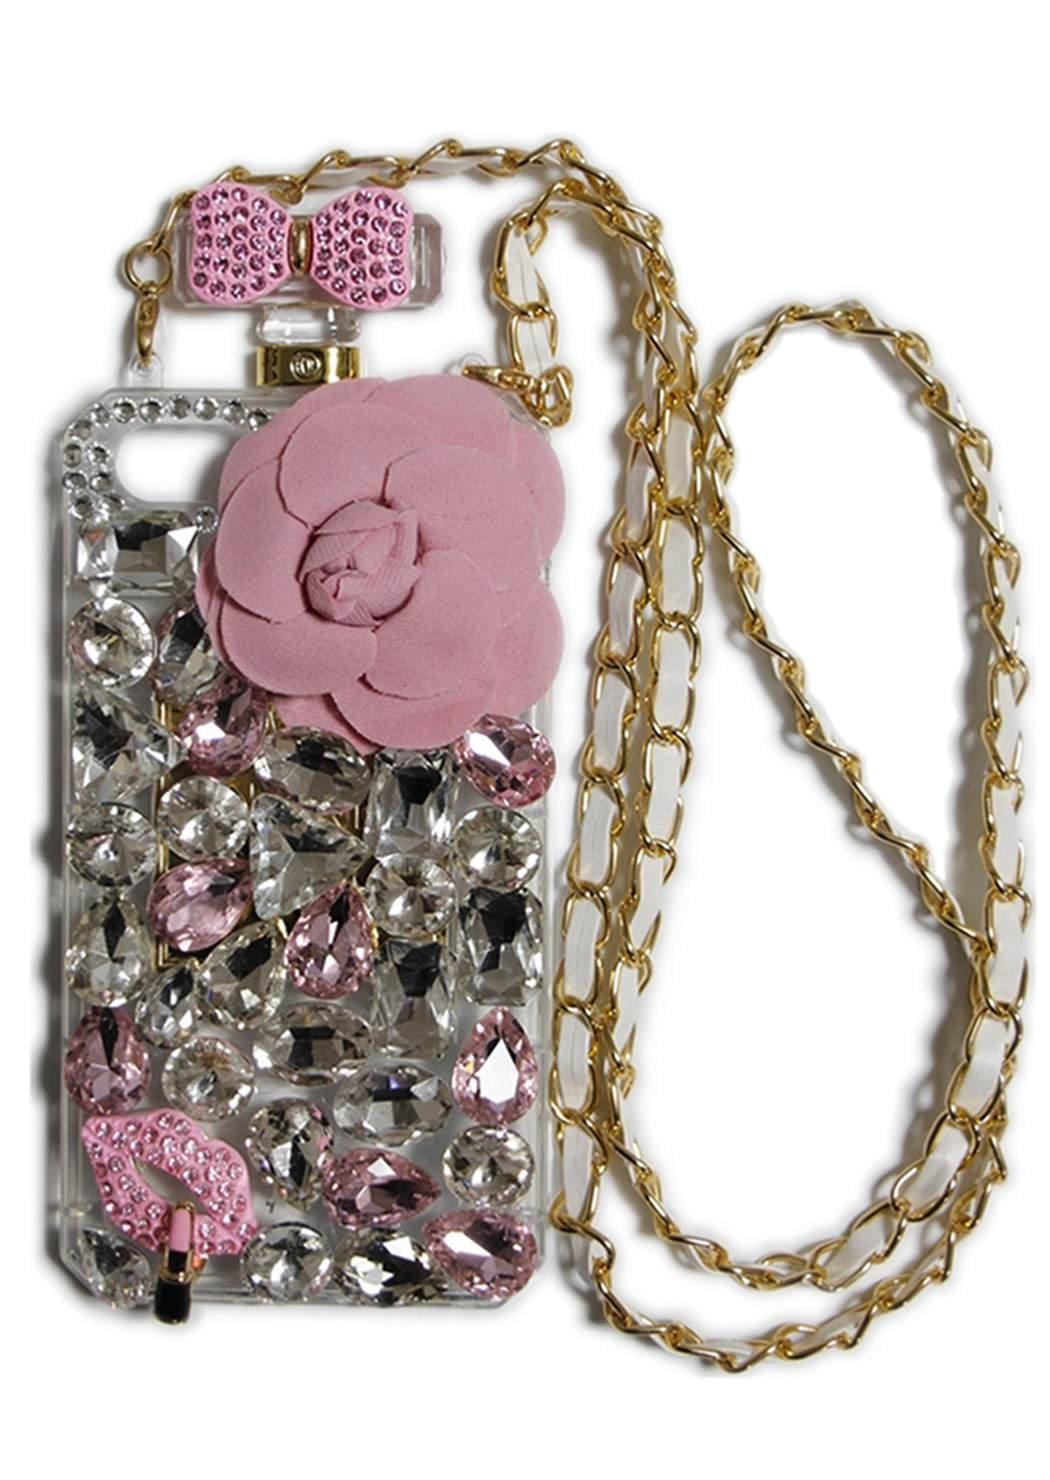 JABITiPhone7 Plus/iPhone7/iPhone6 Plus/6s Plus/iPhone6/6s/iPhone5/5s/SE/闪亮 华丽 时髦 夹克 可爱 女款、女性用 全2色可选 人气手机壳 保护套 苹果手机ip6-544-i7p-silver iPhone7 Plus B款